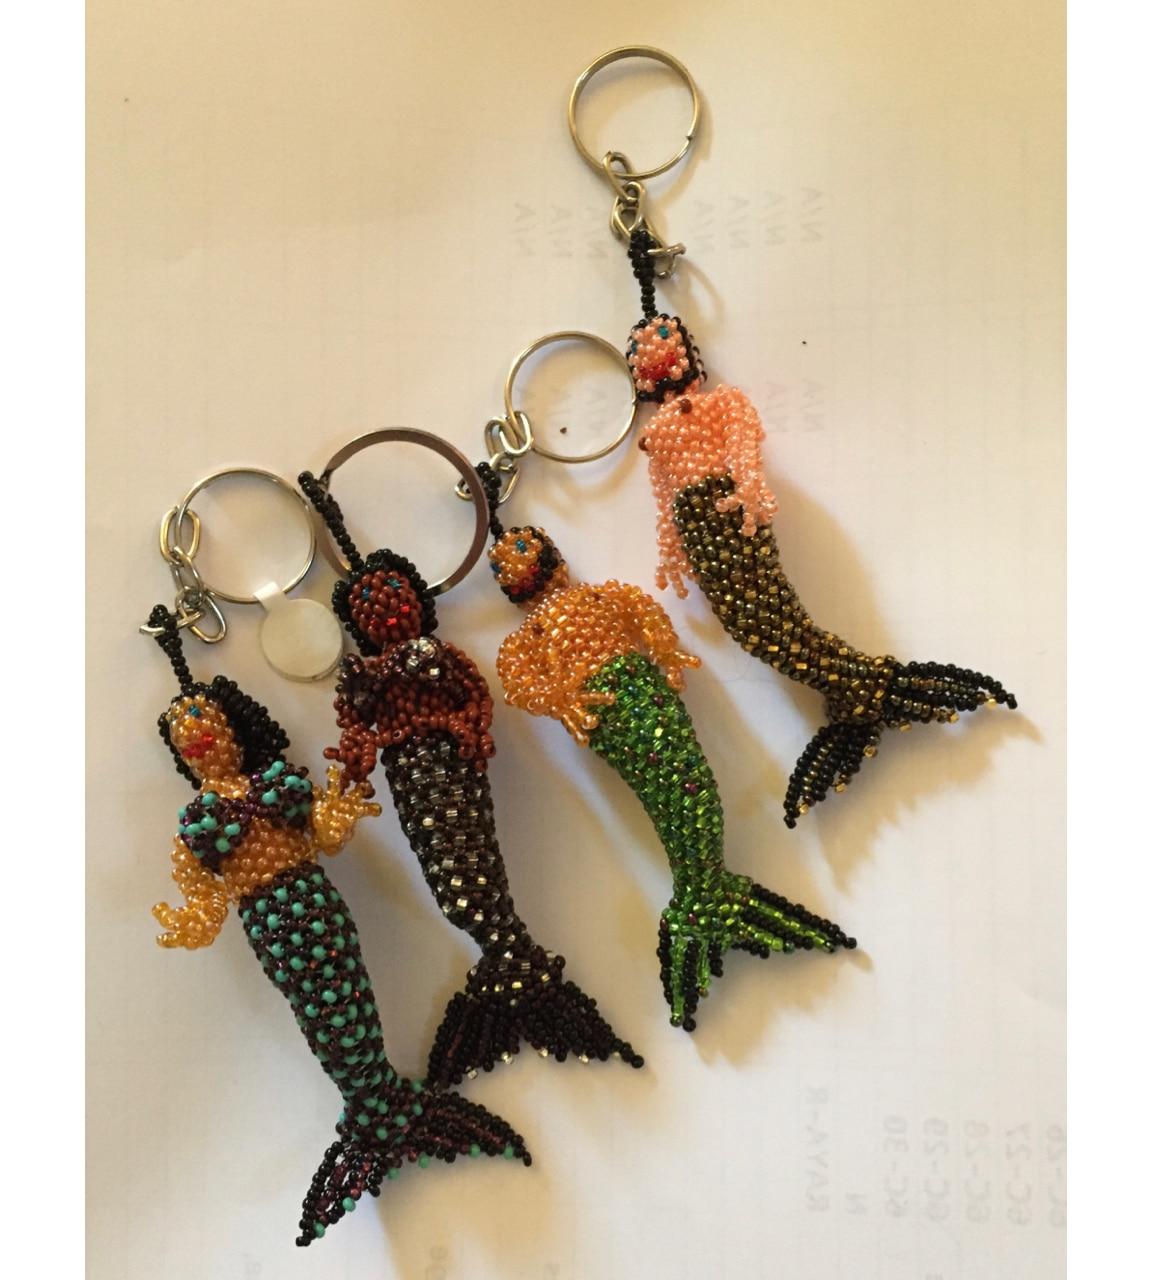 Mermaid and Merman Beaded Ornaments